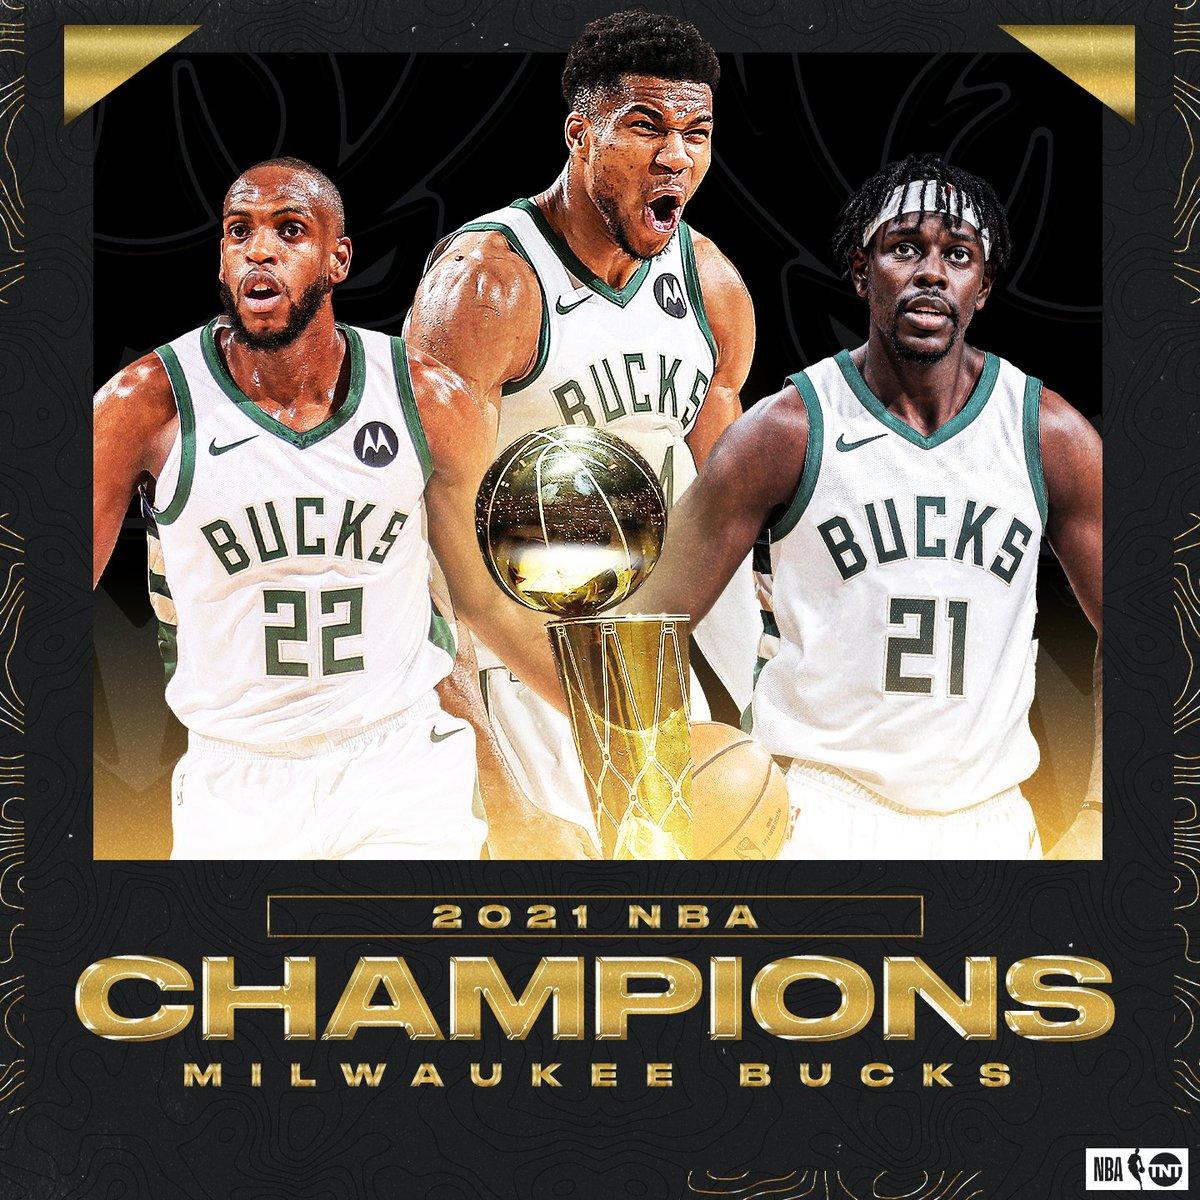 @NBAonTNT's photo on Milwaukee Bucks